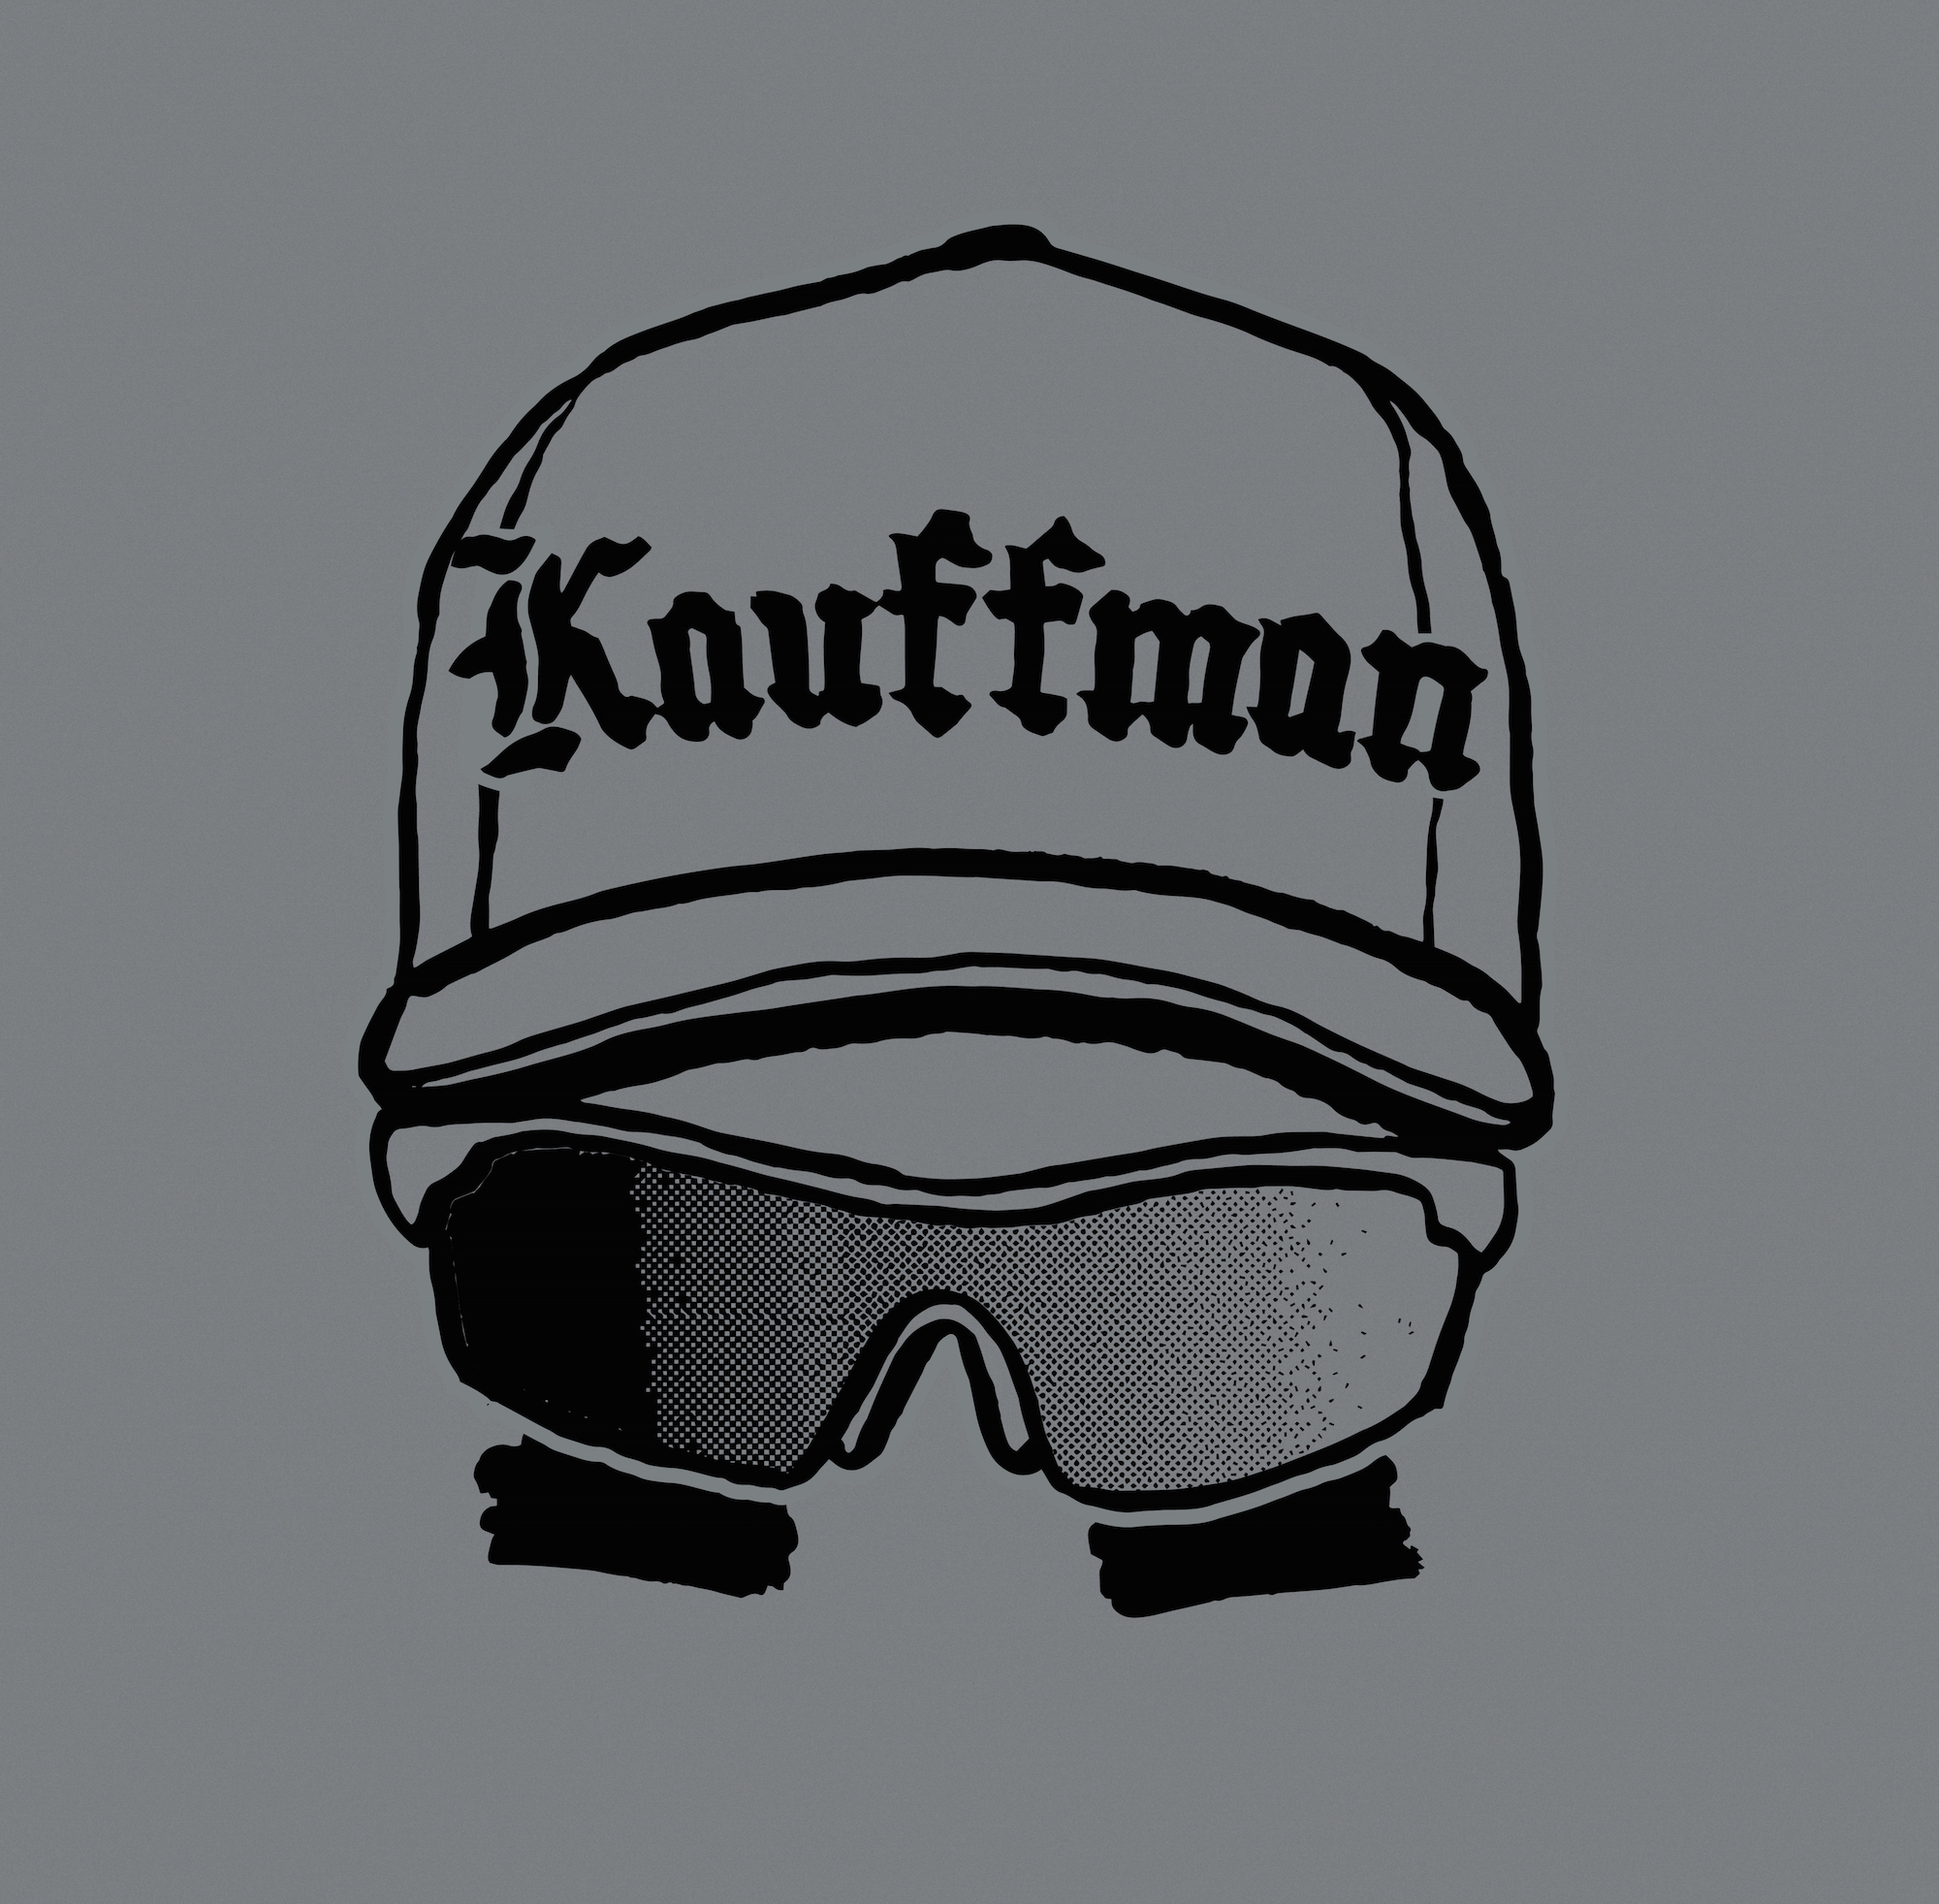 kauffman.jpg